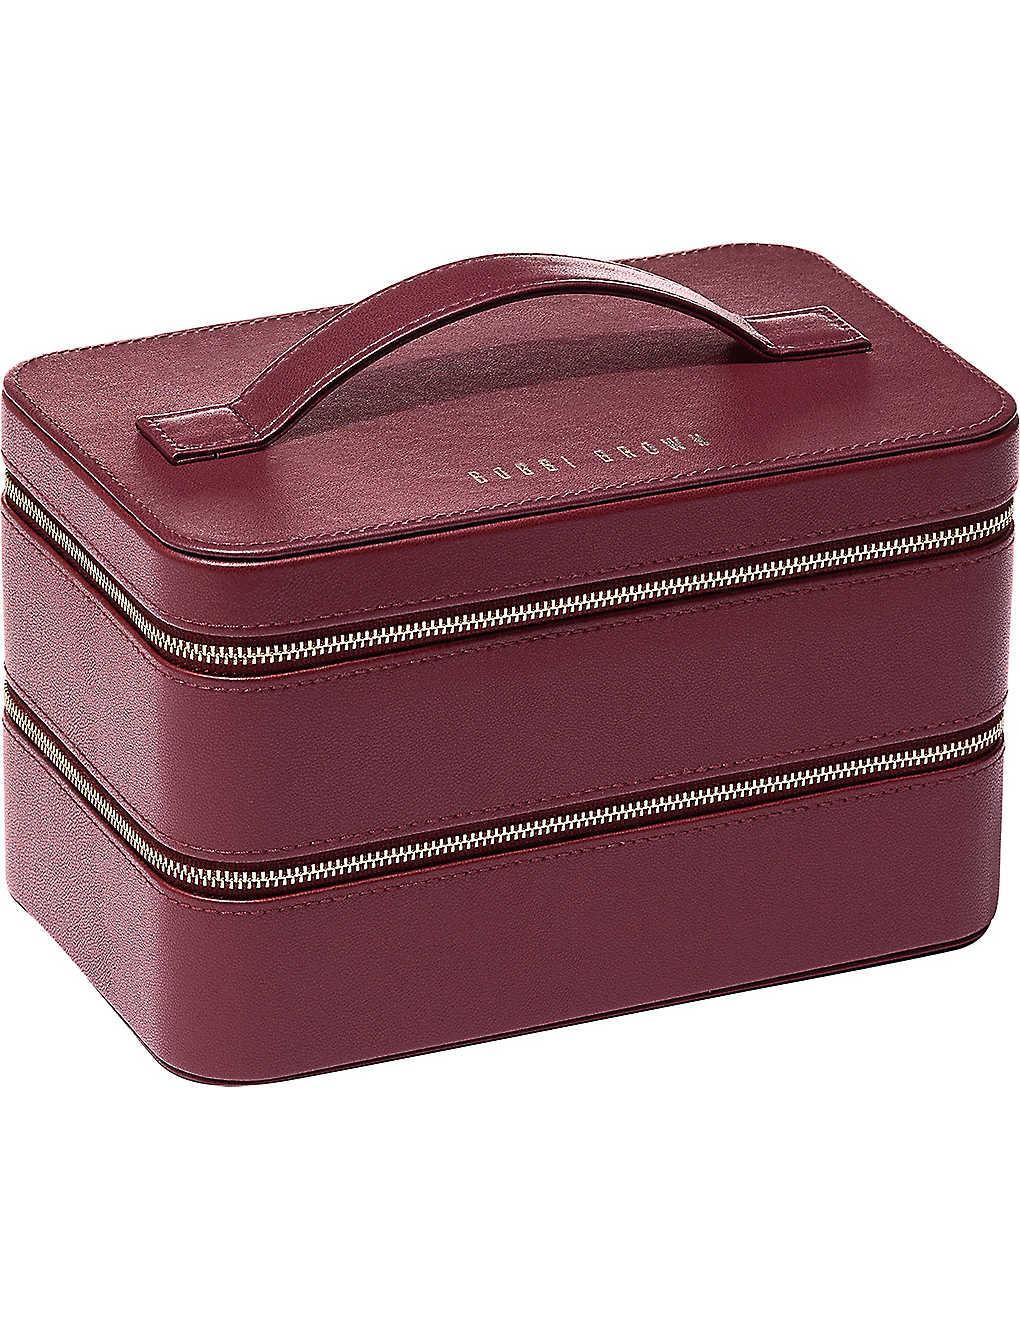 BOBBI BROWN - Faux-leather beauty case  d190baa9680b9